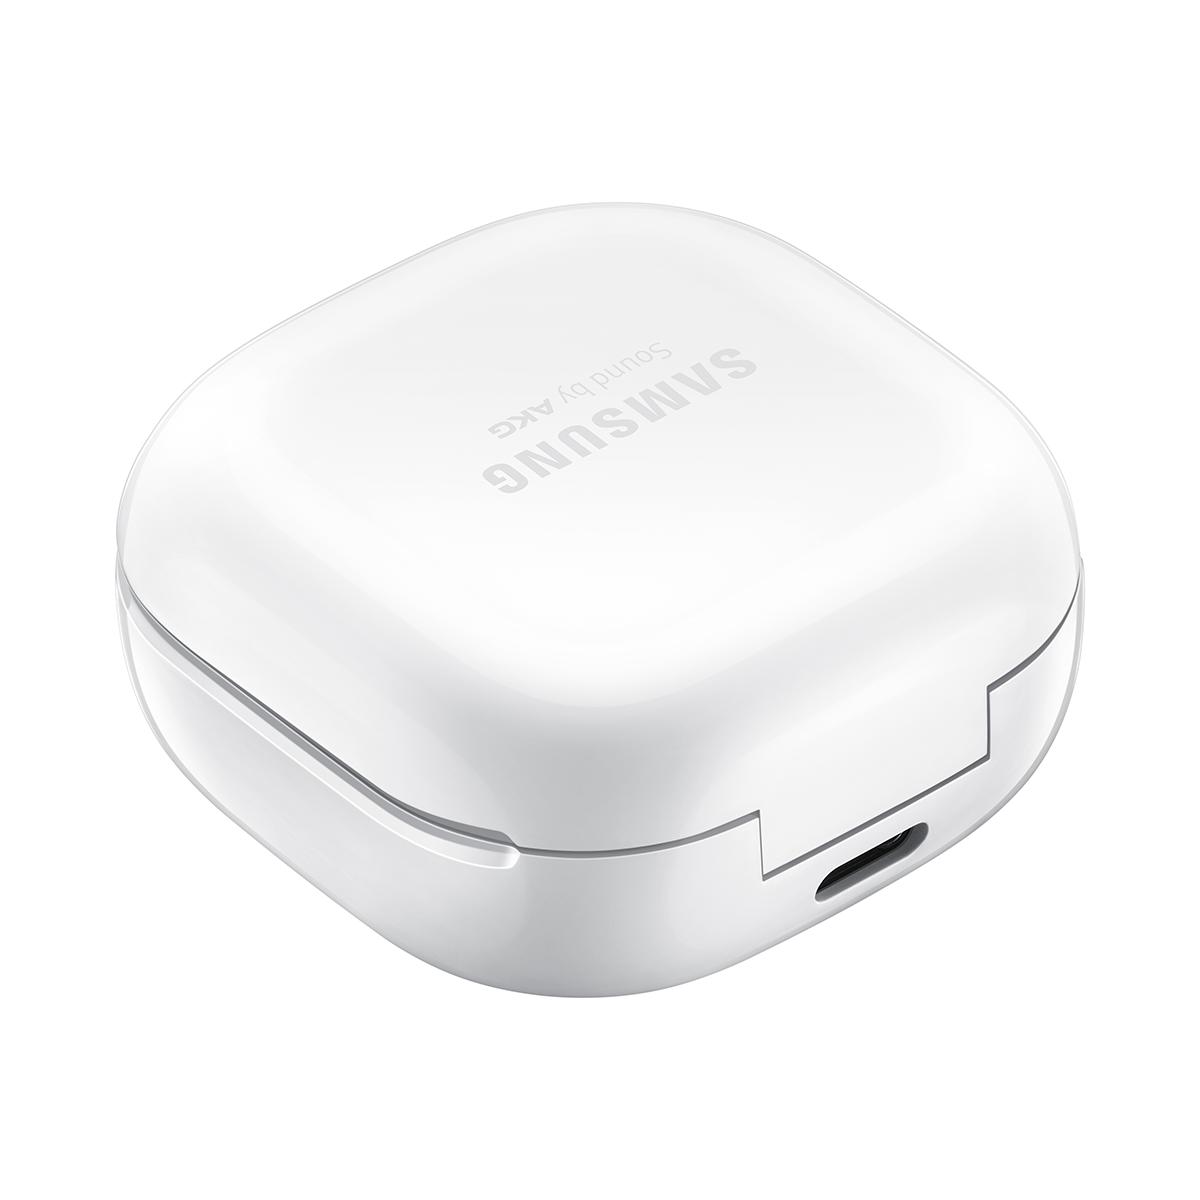 Samsung Galaxy Note10plus